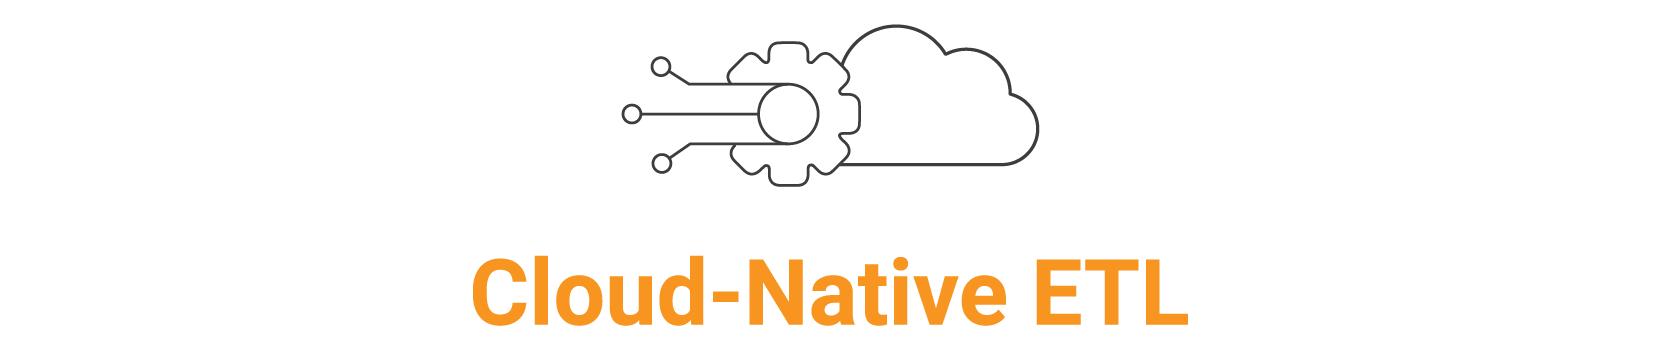 Cloud-Native ETL  + ICON copy 2 (1)